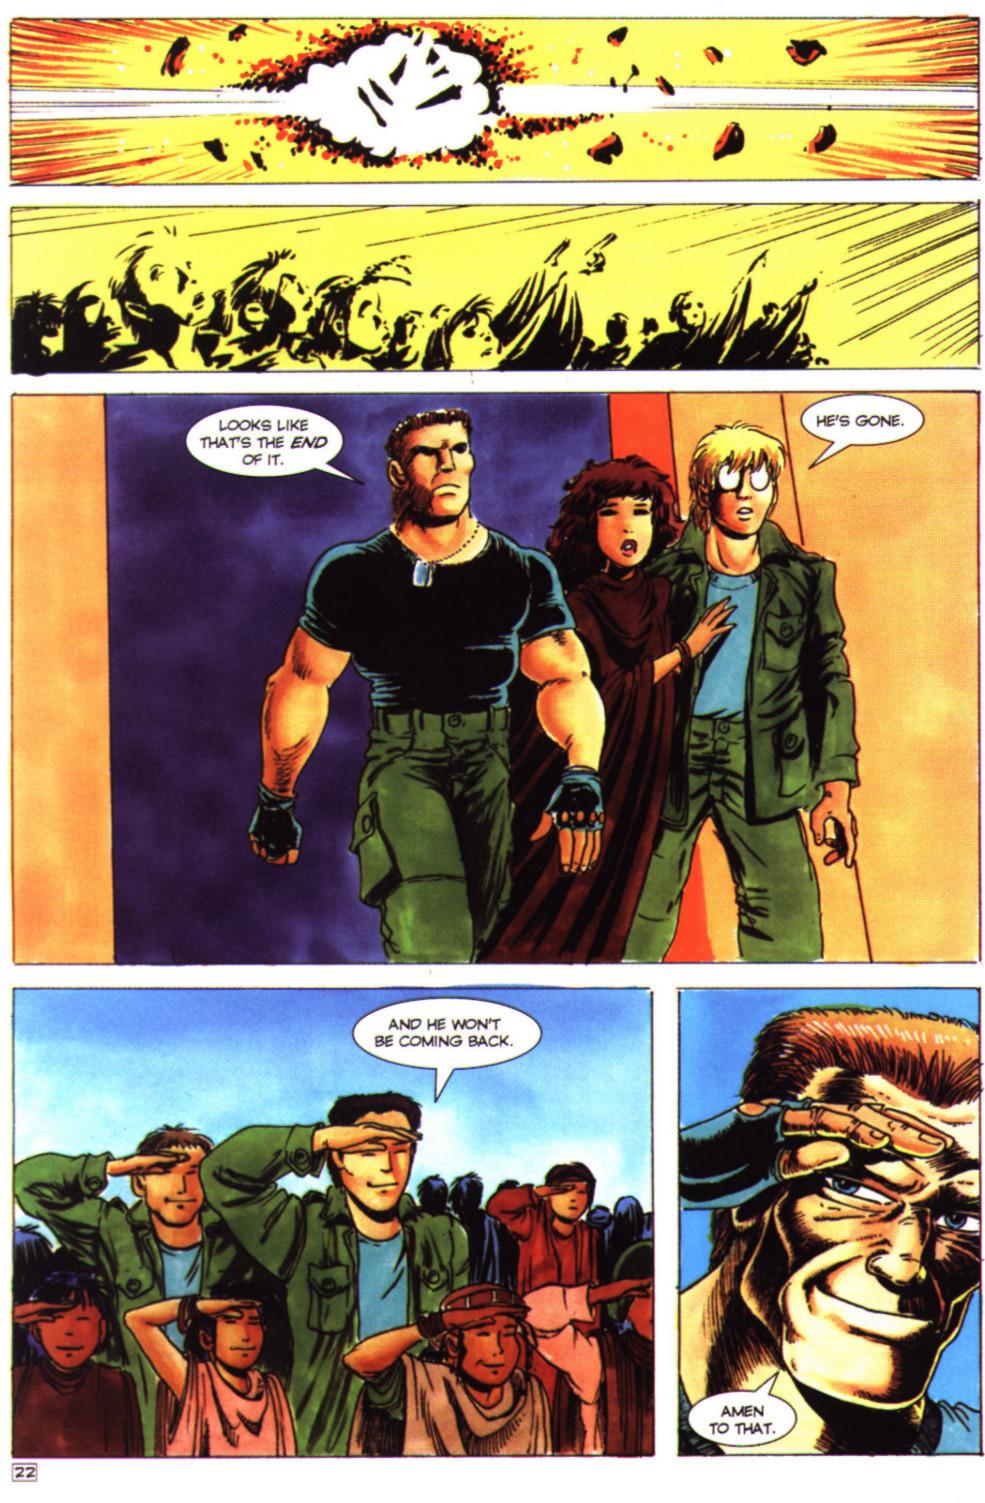 Read online Stargate comic -  Issue #4 - 24